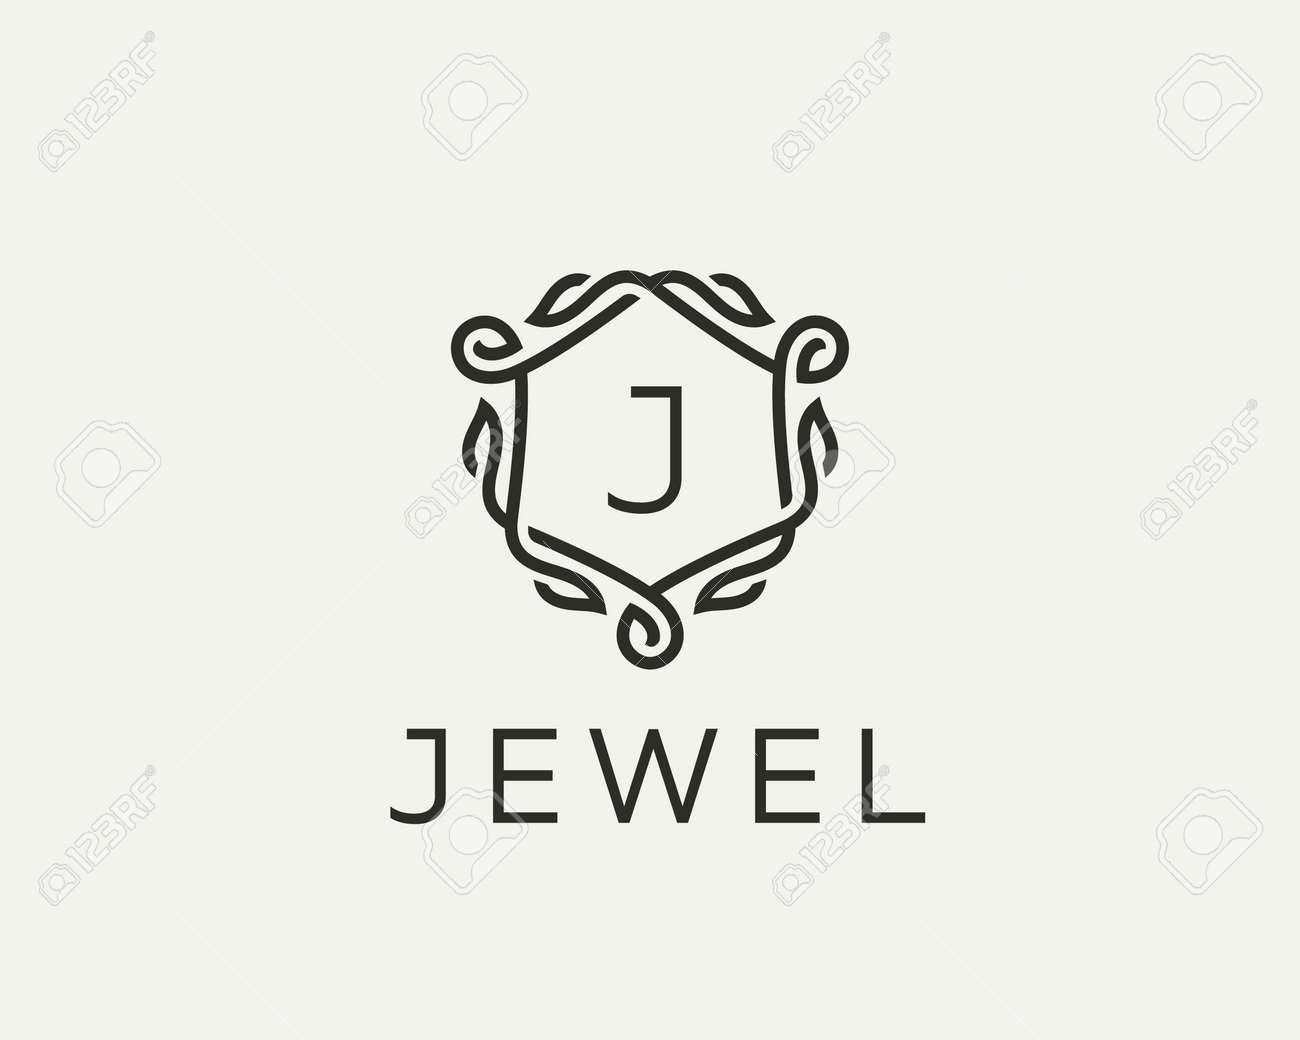 Premium Linear Shield Monogram Letter J Logotype Elegant Crest Royalty Free Cliparts Vectors And Stock Illustration Image 121672737